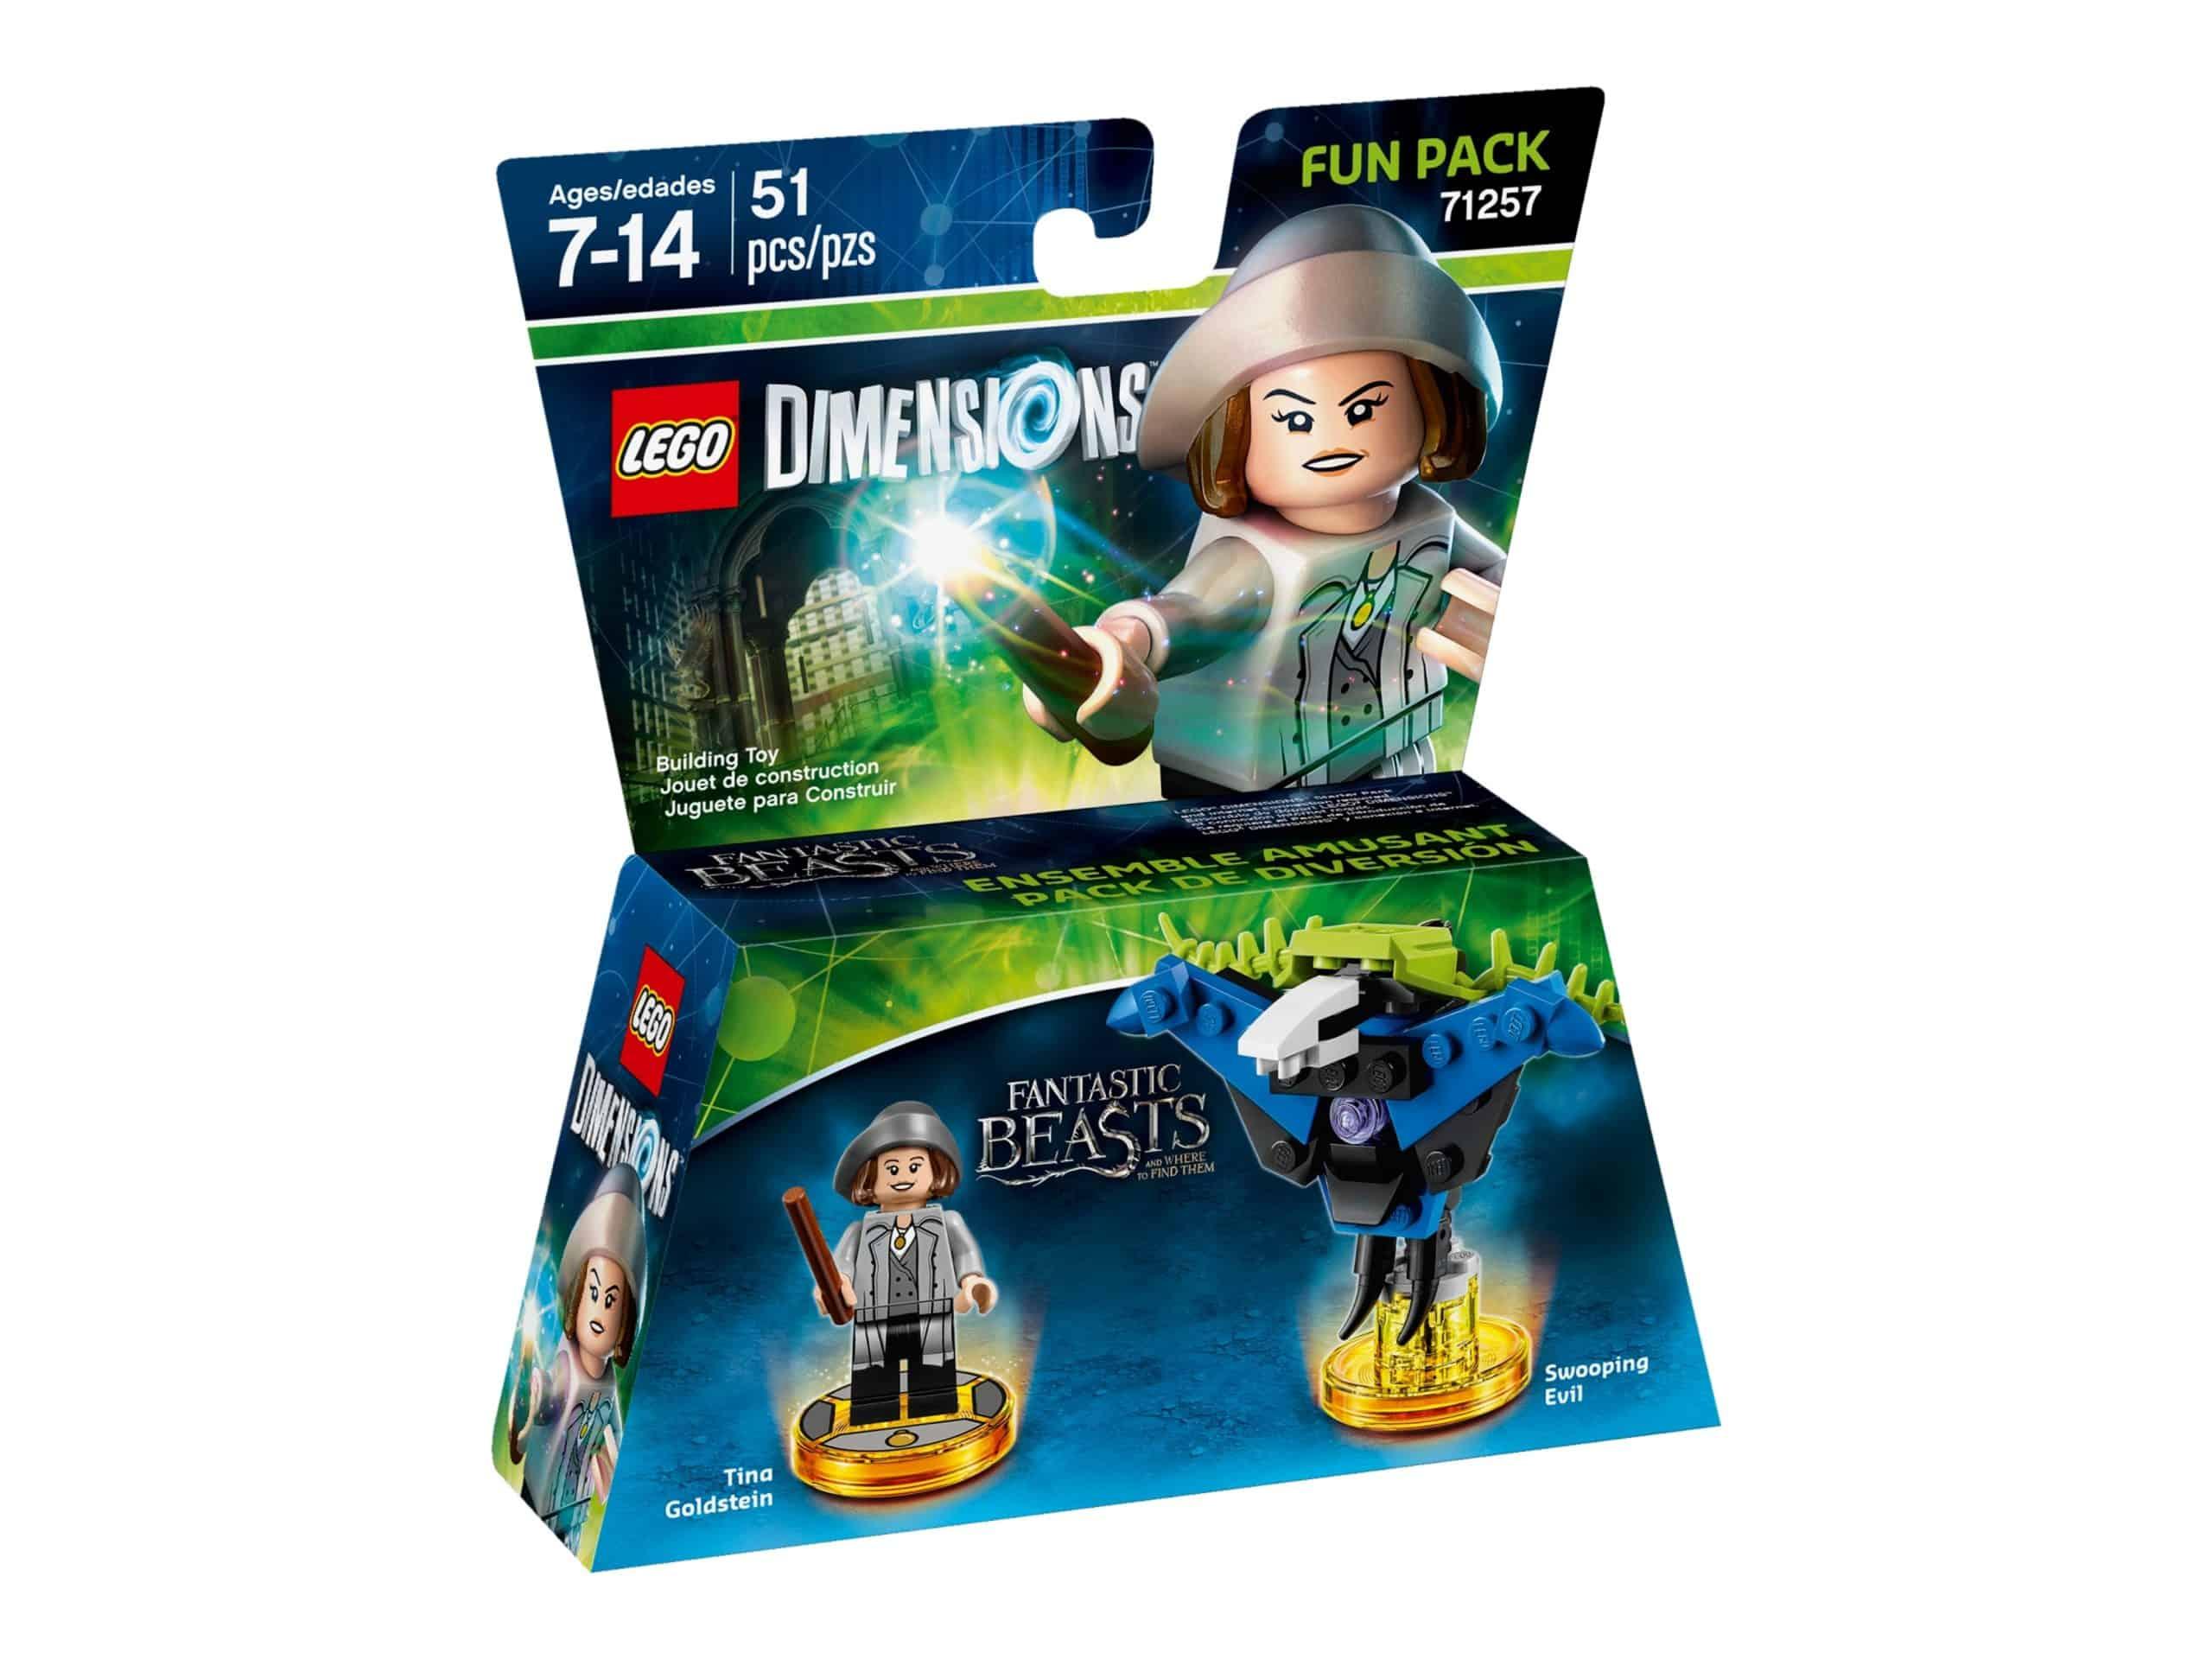 lego 71257 tina goldstein fun pack scaled